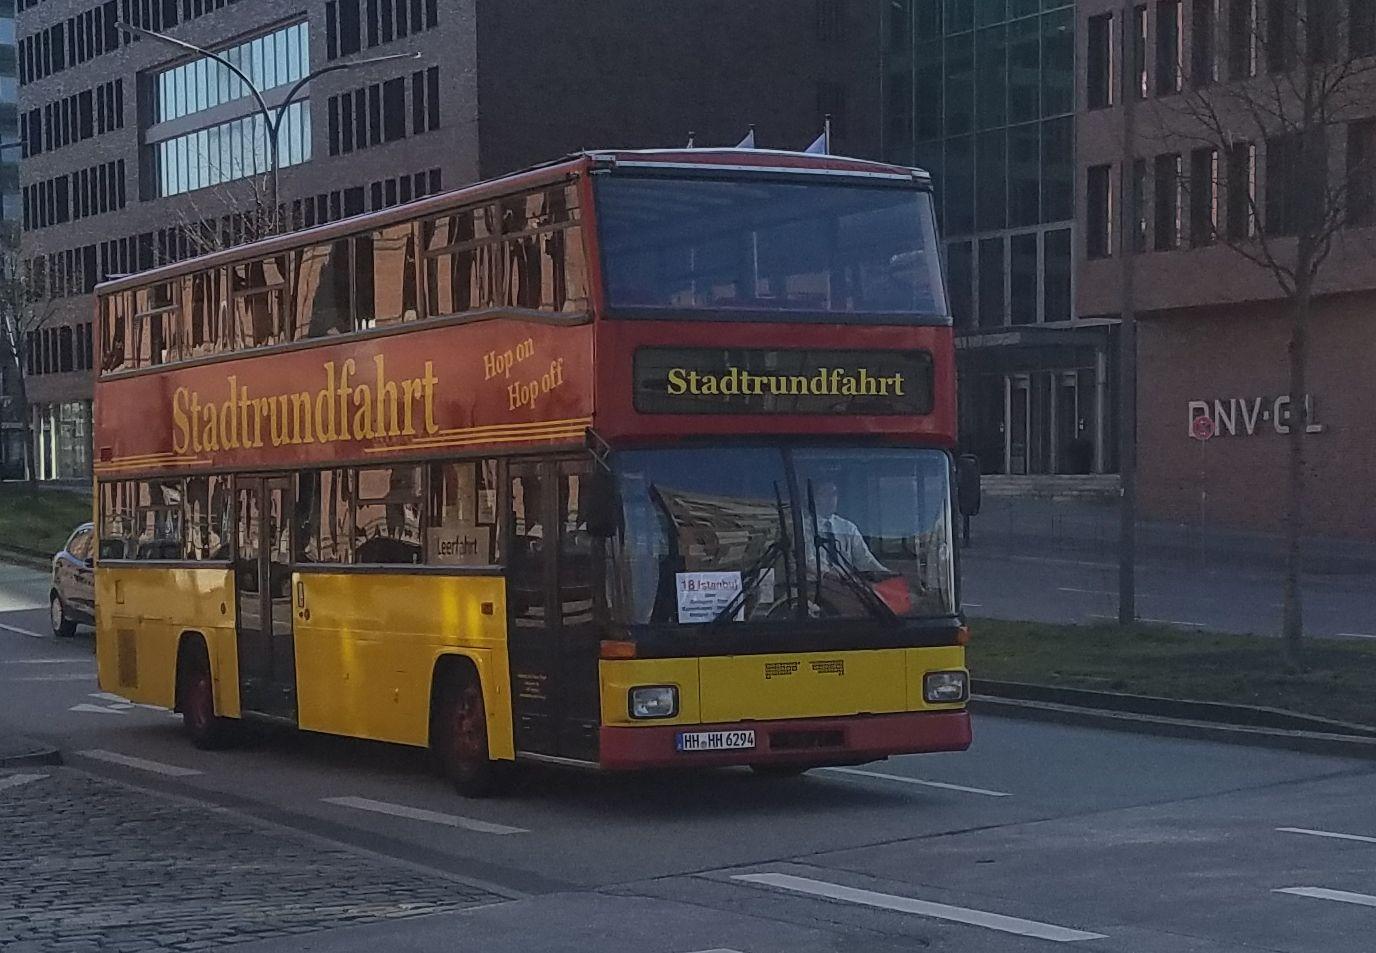 Foto: Bus 3959, Typ D92, Stadtrundfahrtbus HH HH 6294, Hamburg, März 2017